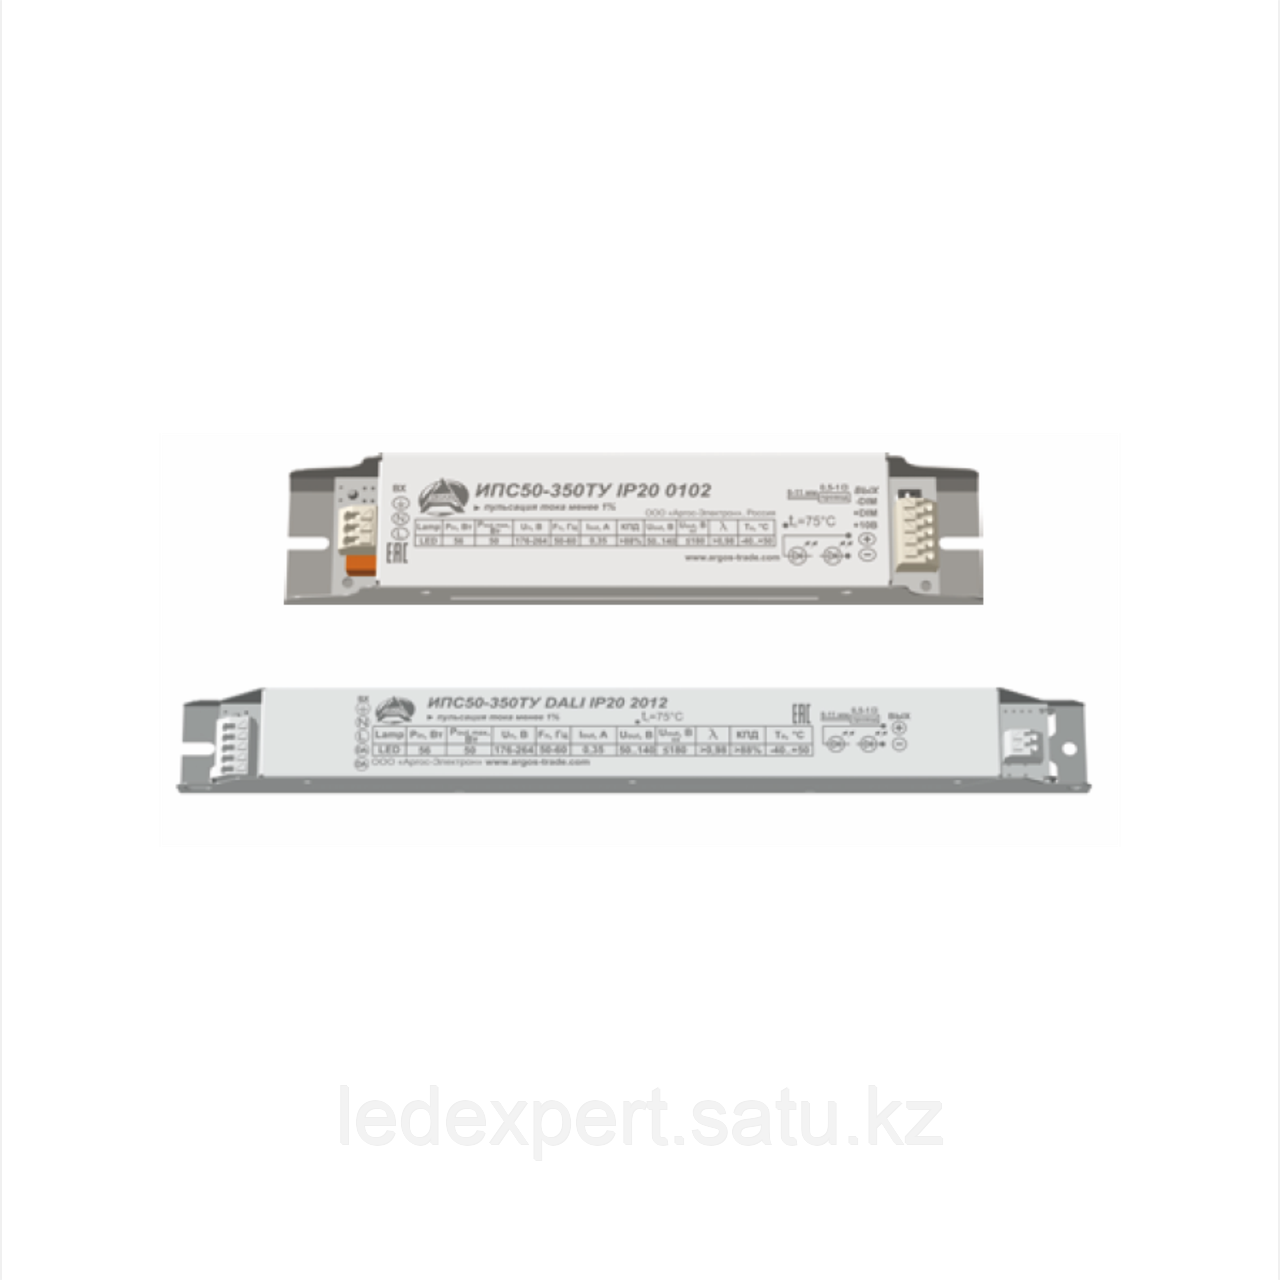 Источник питания Аргос ИПС50-350ТУ DALI IP20 2012